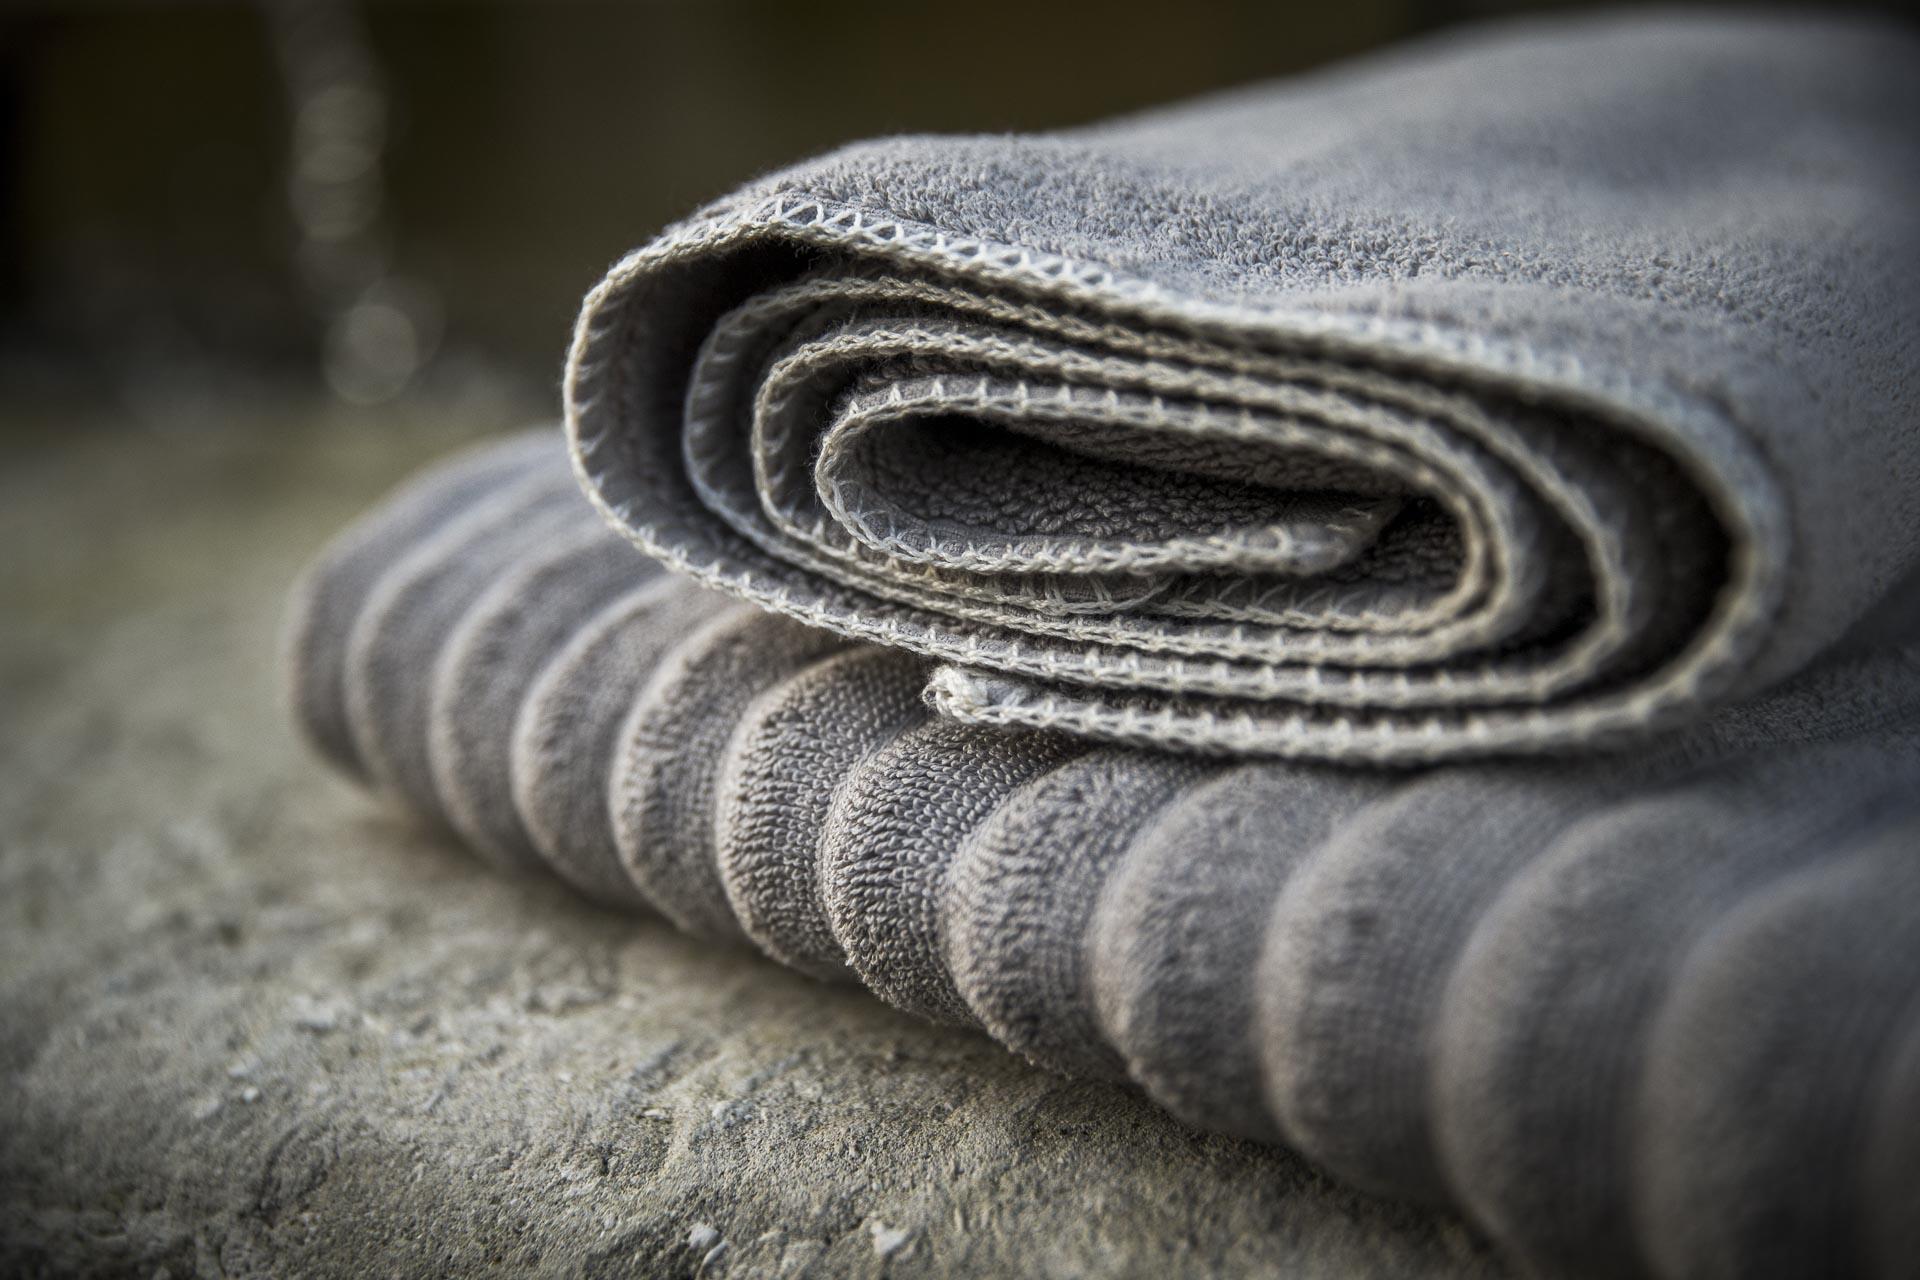 L&L_Textiles©stephane_leroy-E61R5344.jpg